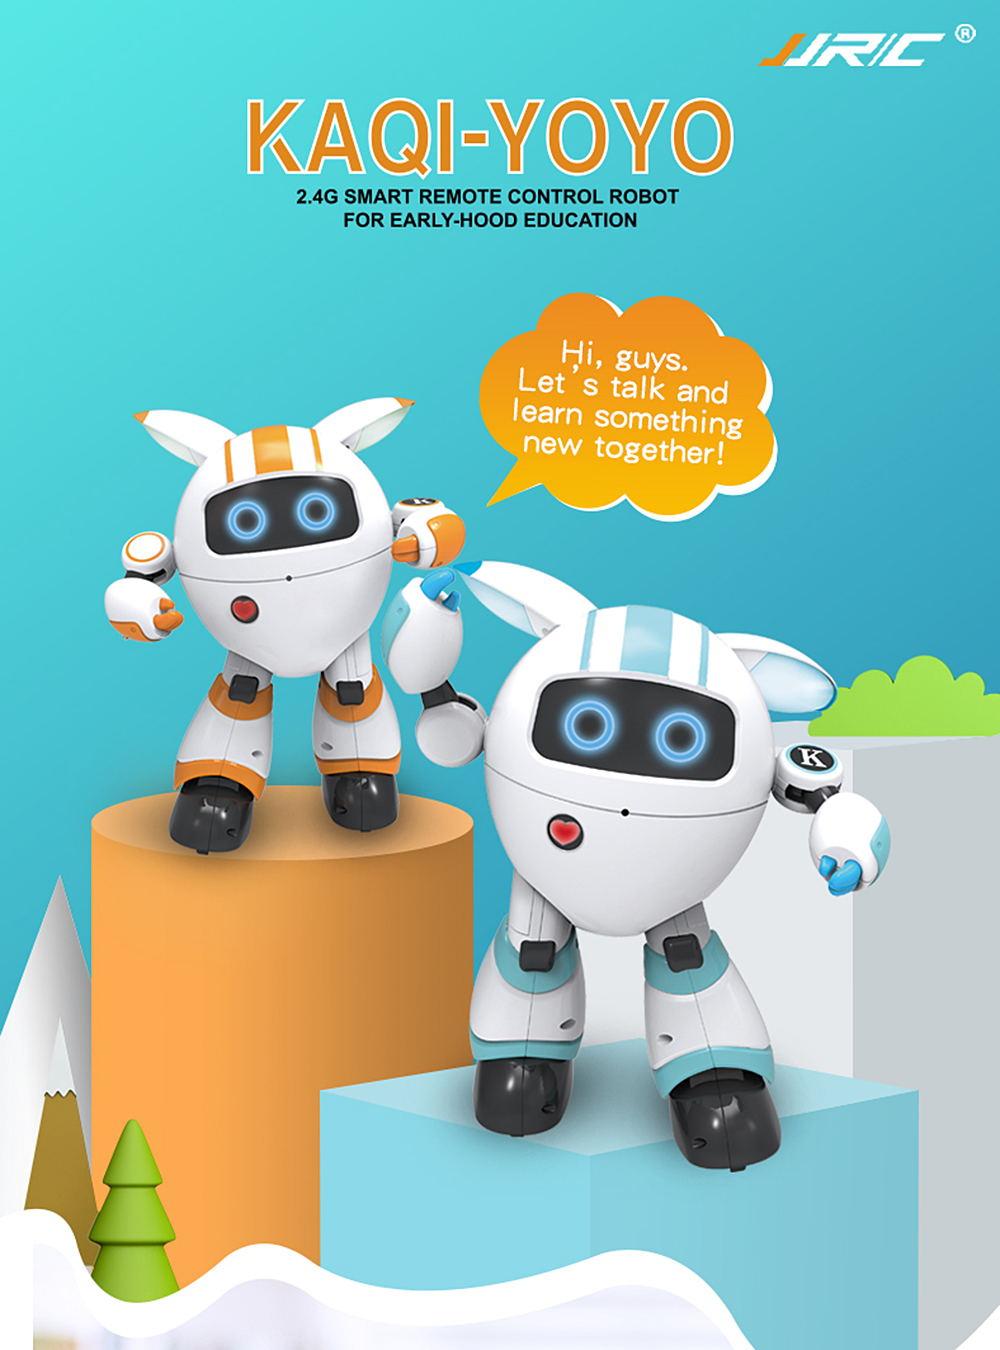 jjrc r14 kaqi-yoyo smart rc robot